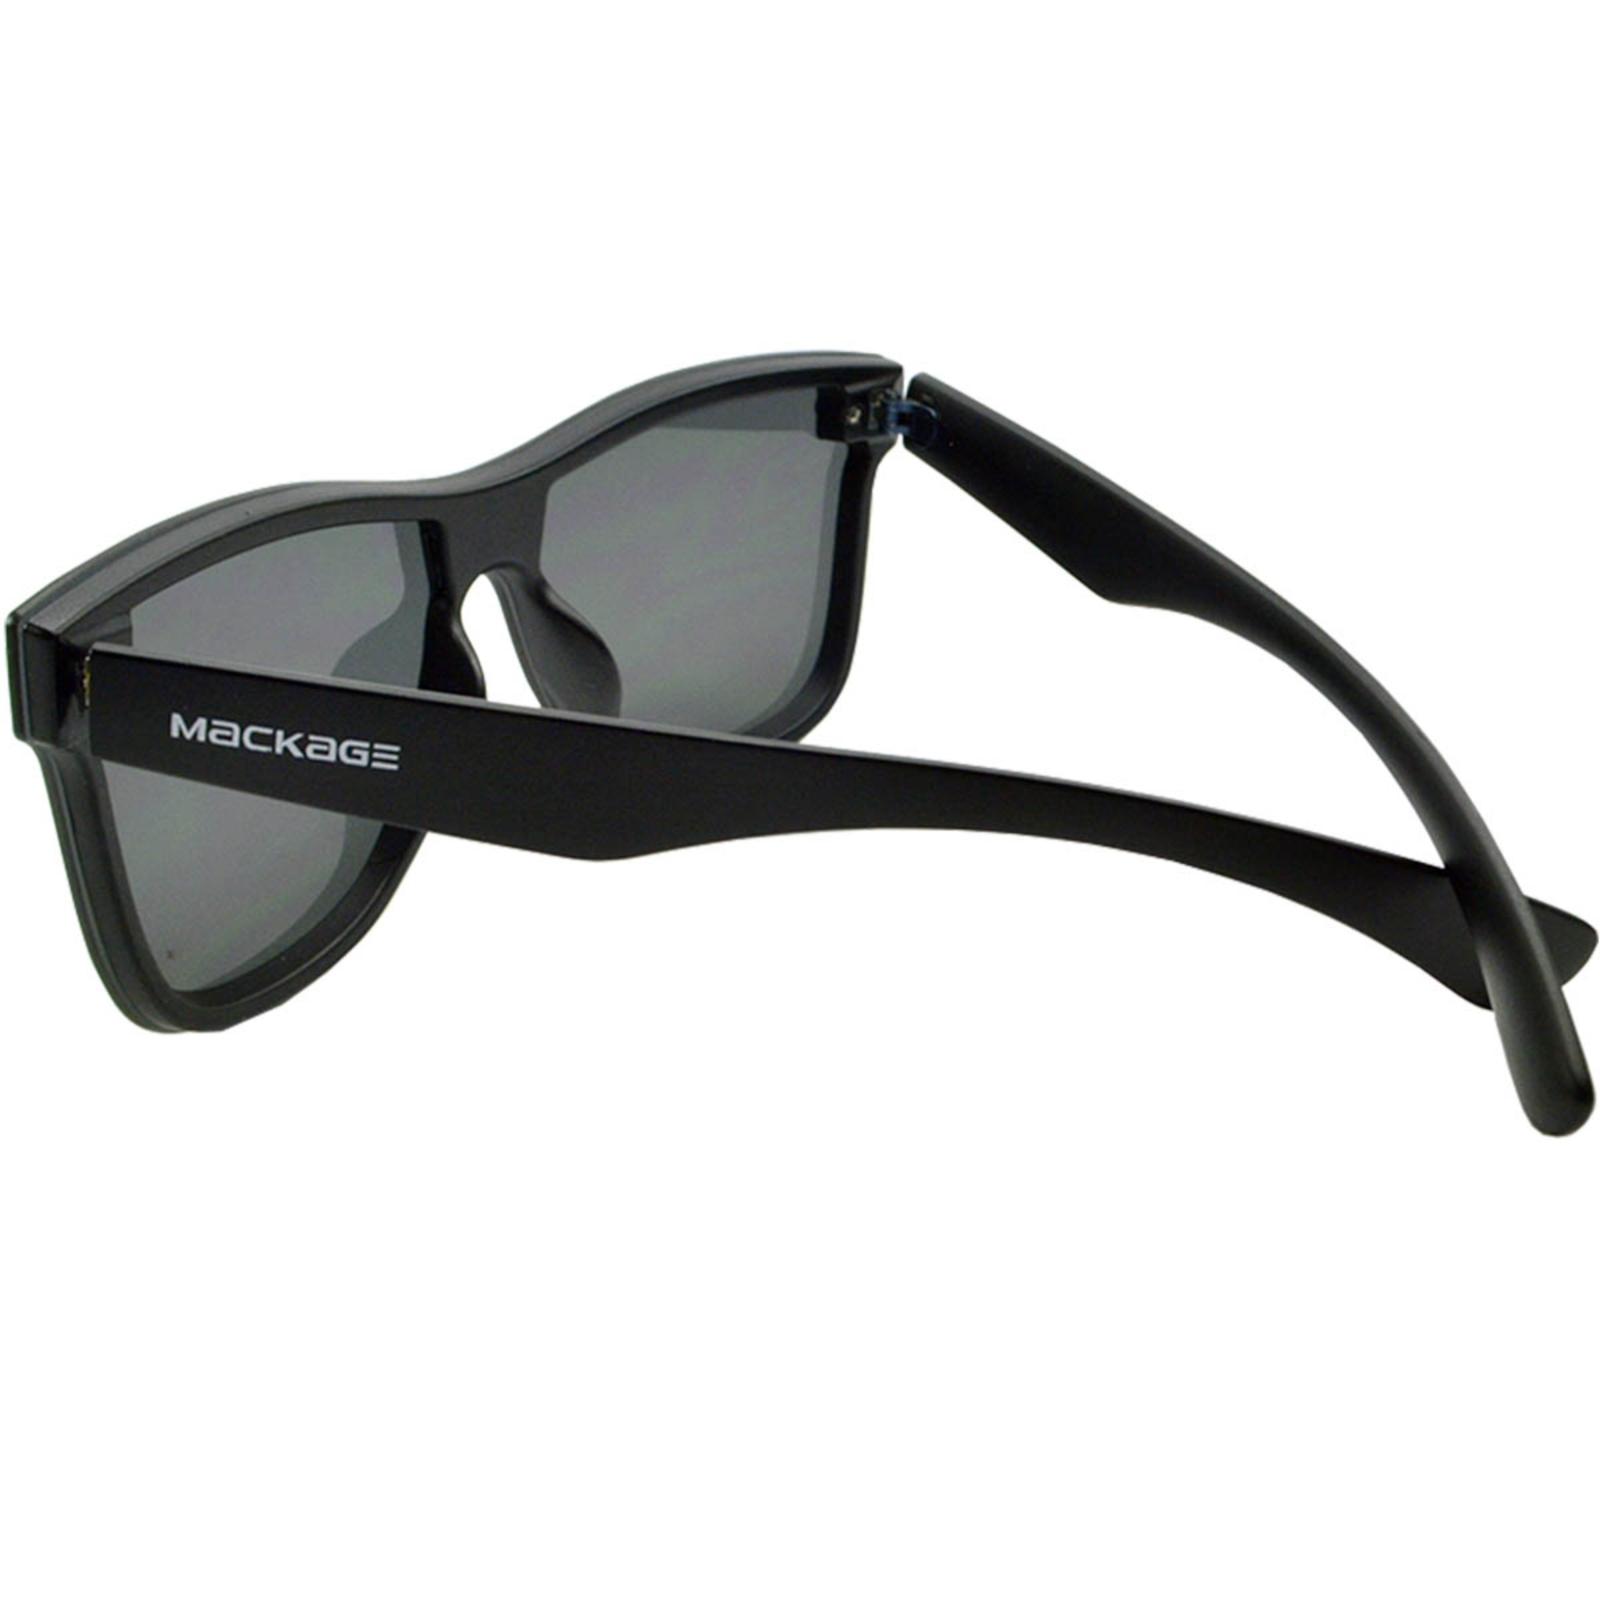 Óculos De Sol Mackage Unissex Acetato New Wayfarer